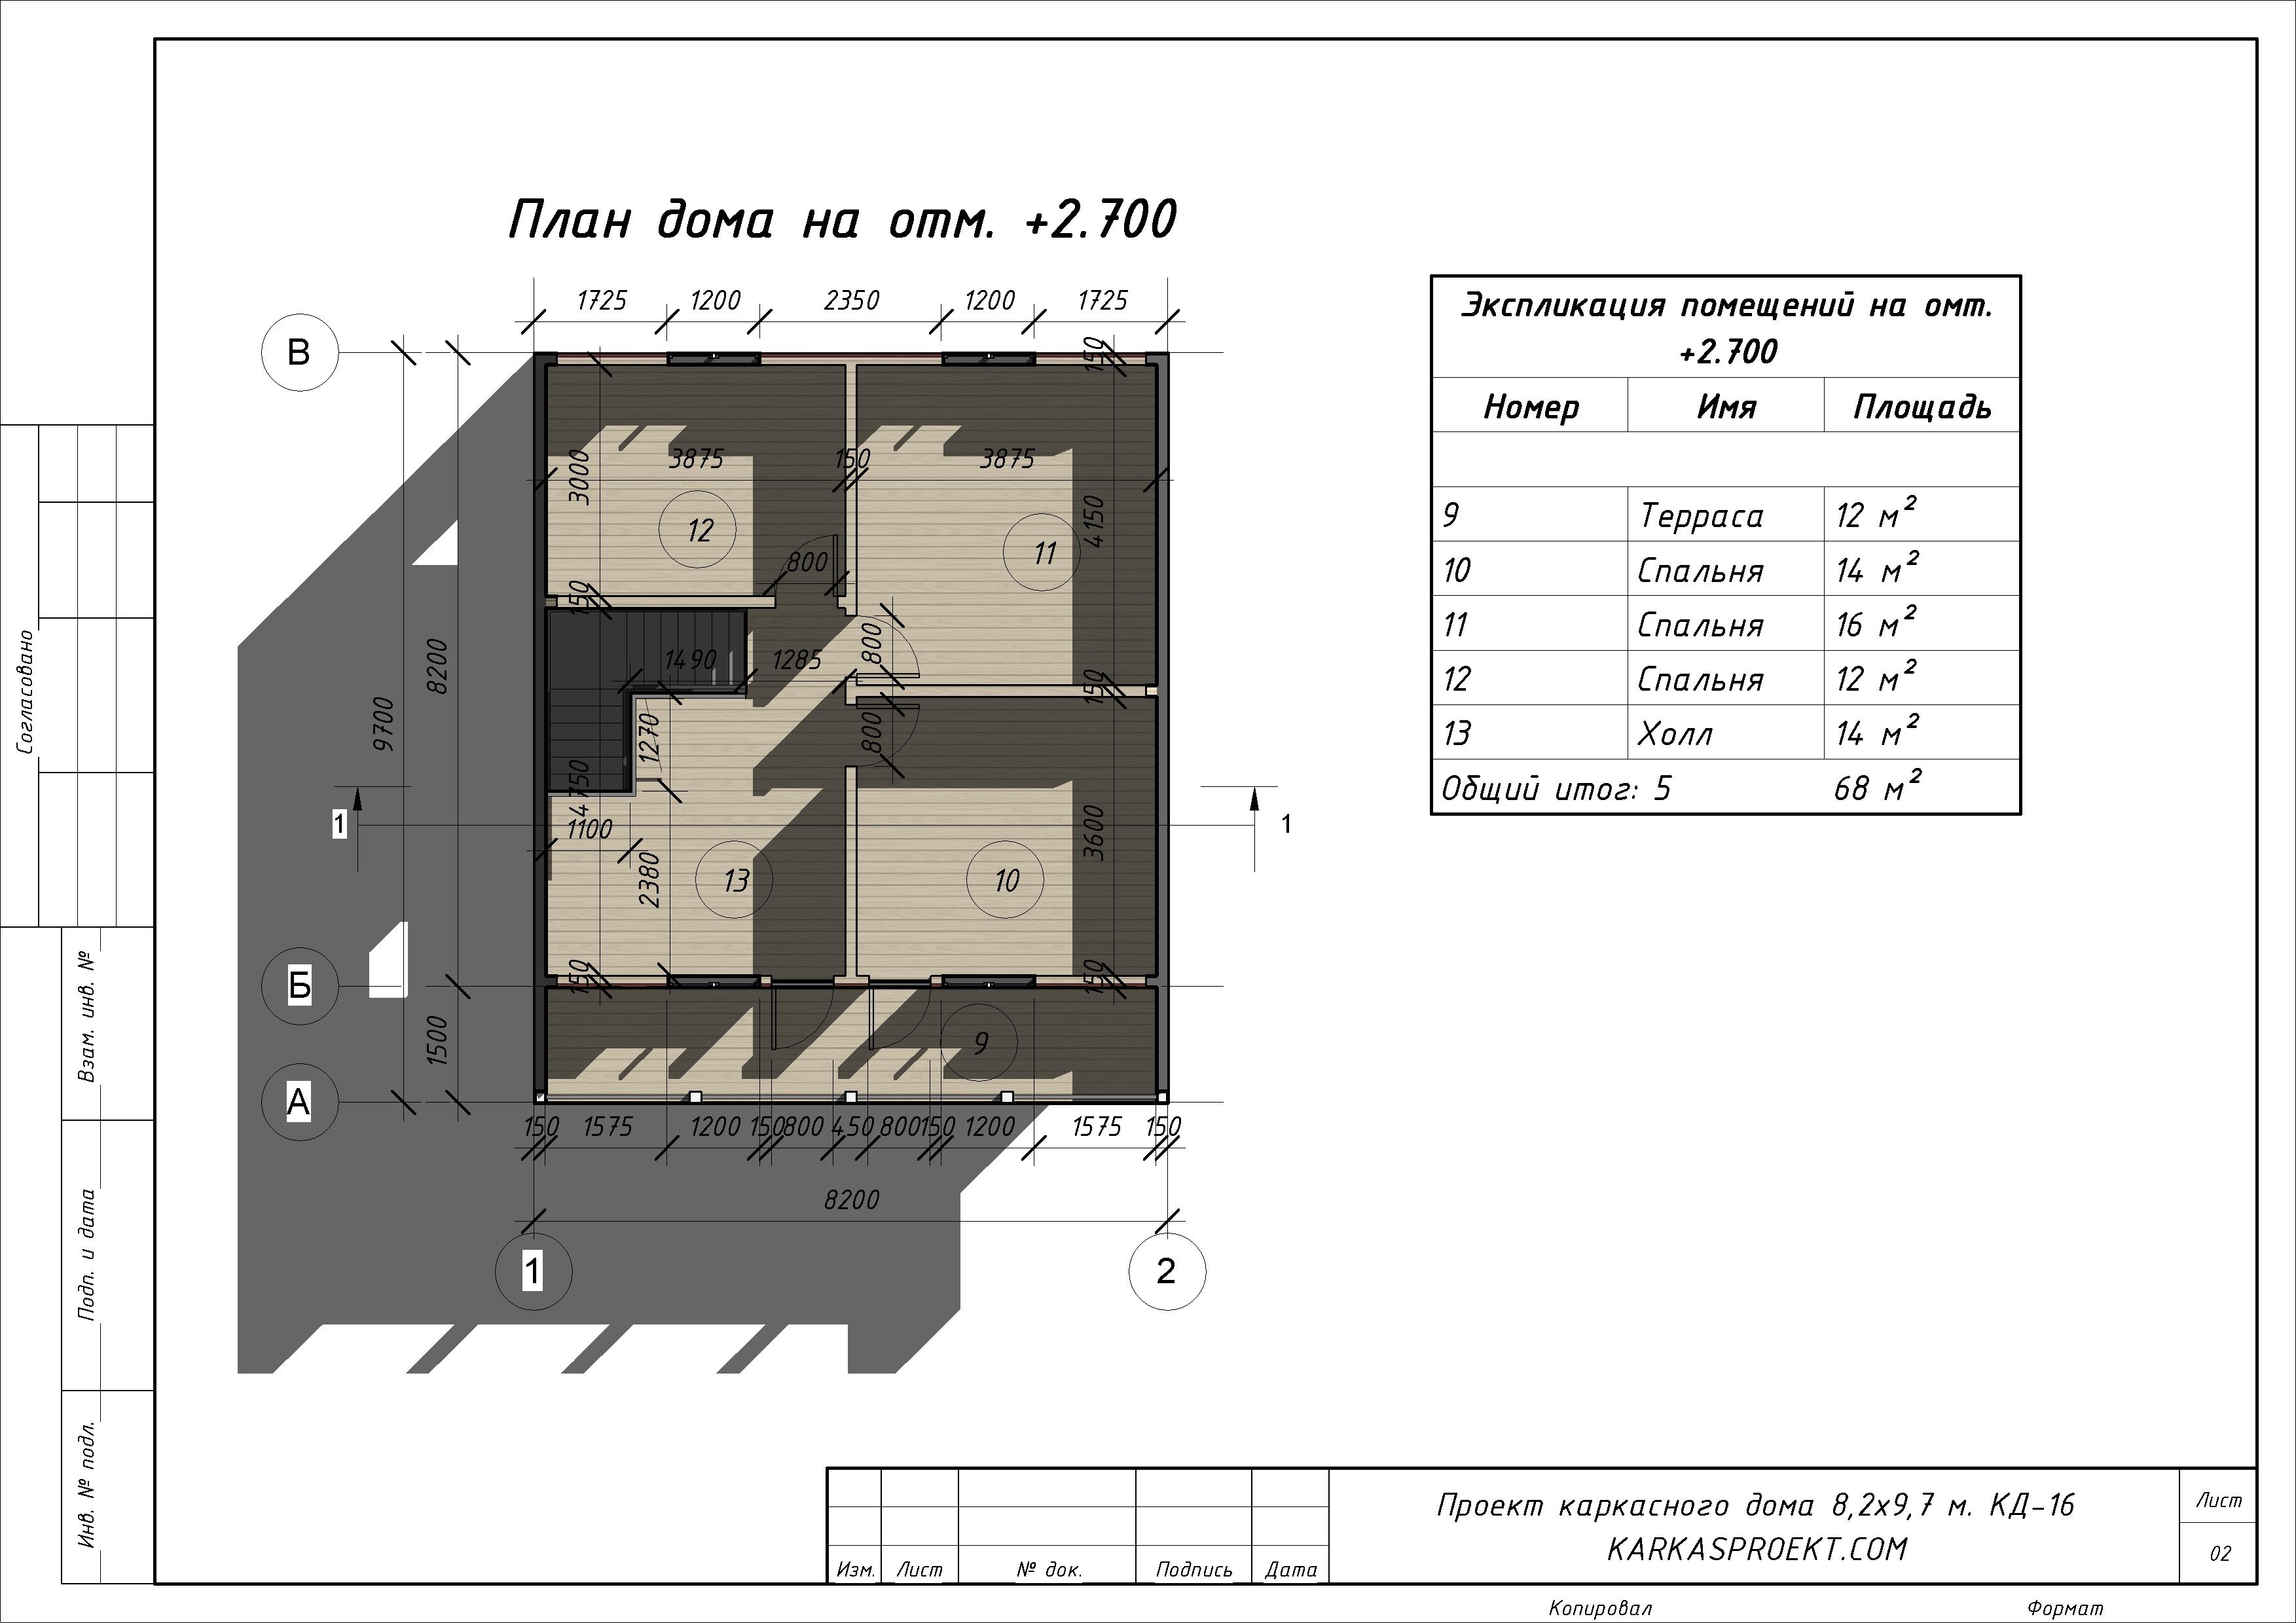 КД-16 - План 2-го этажа